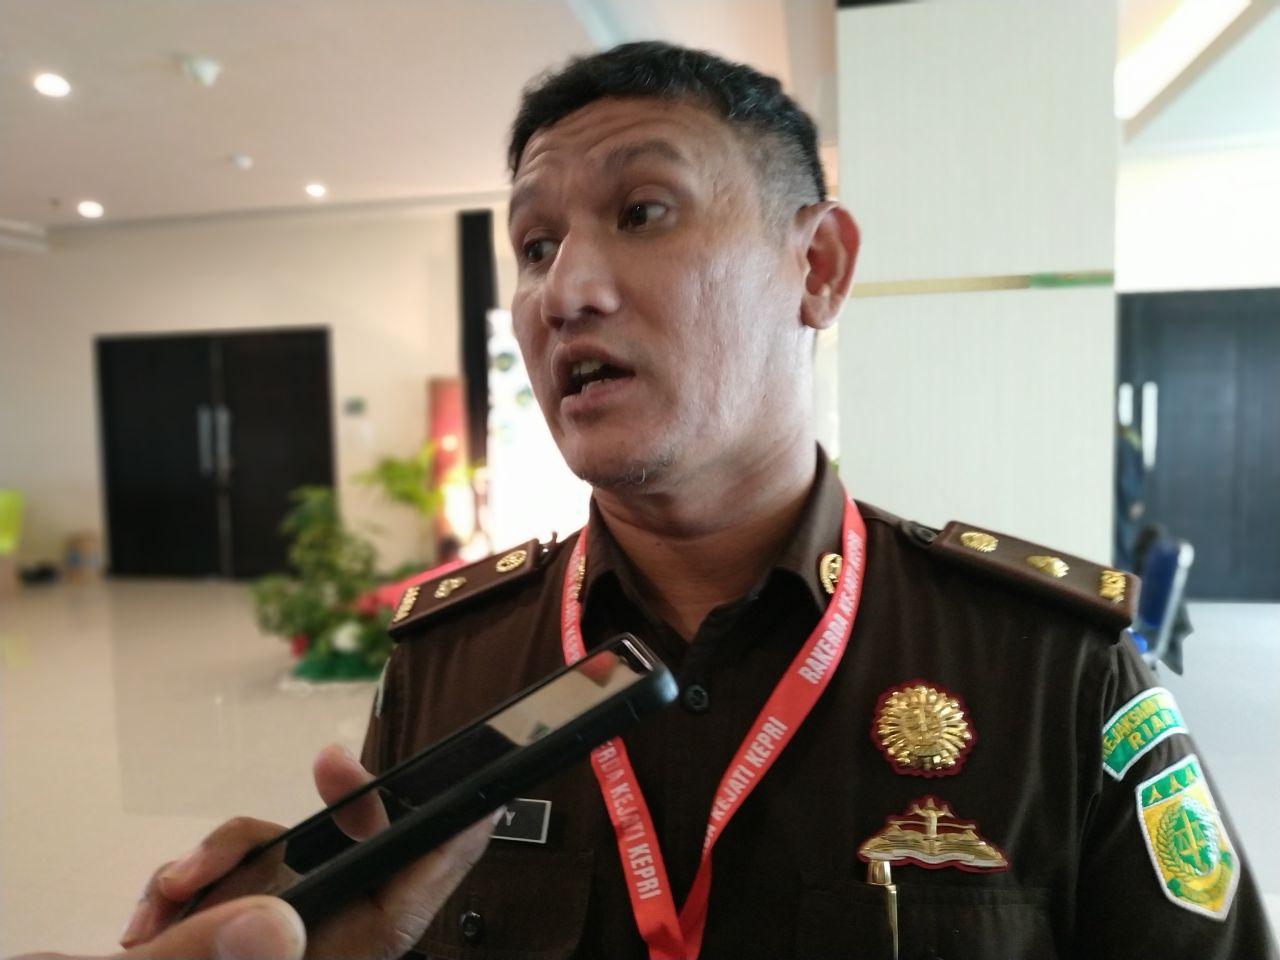 Rumah Jaksa Kebanjiran, Pemeriksaan Saksi Dugaan Korupsi Pajak Ditunda